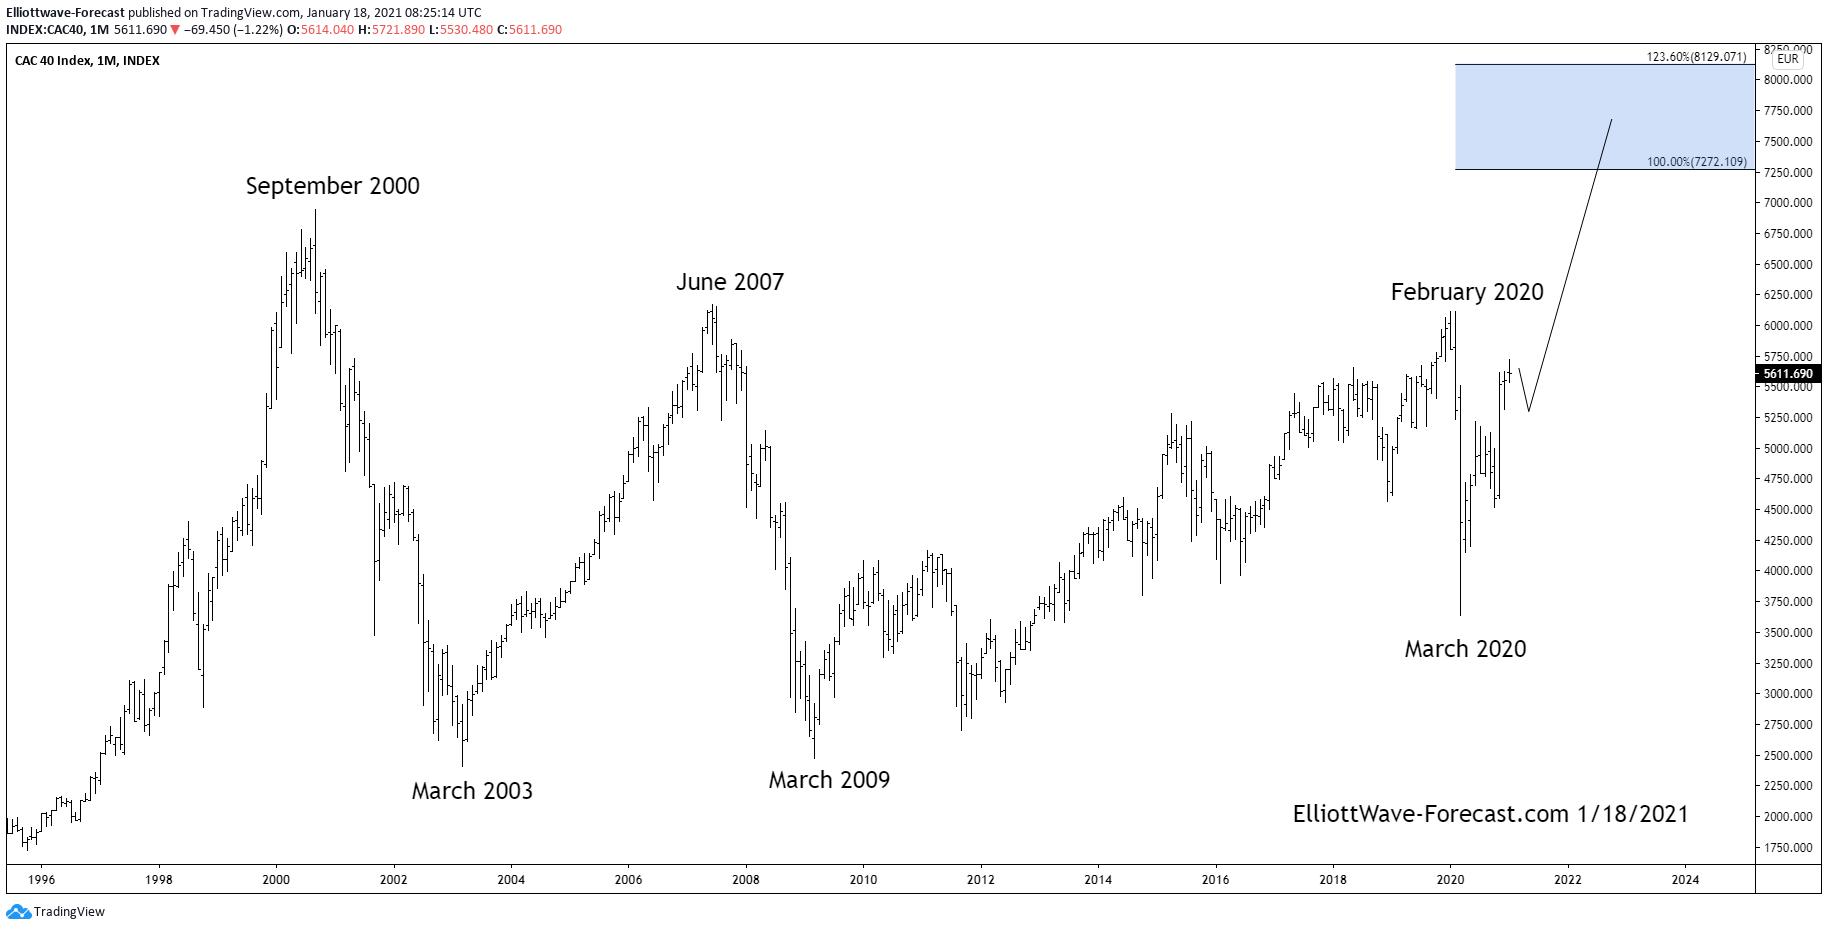 The $CAC40 Longer Term Bullish Swings and Cycles